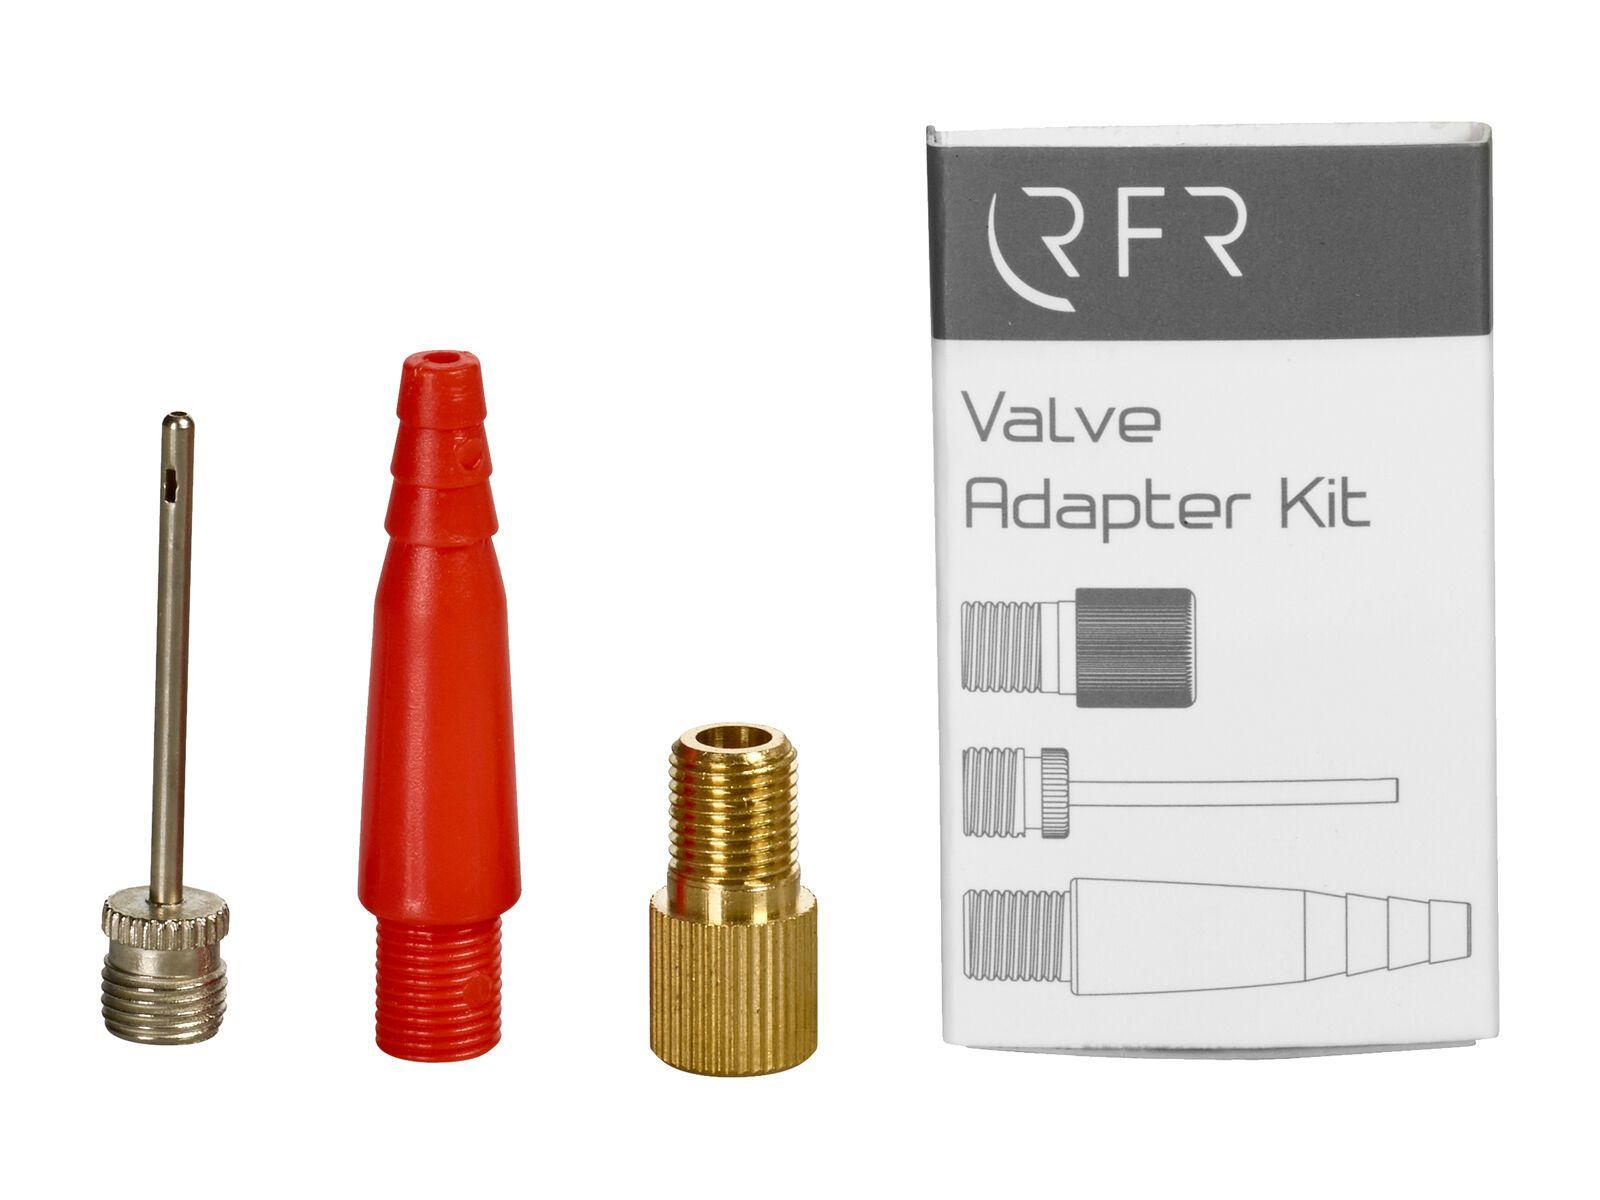 Cube RFR Ventiladapter Kit 404210000